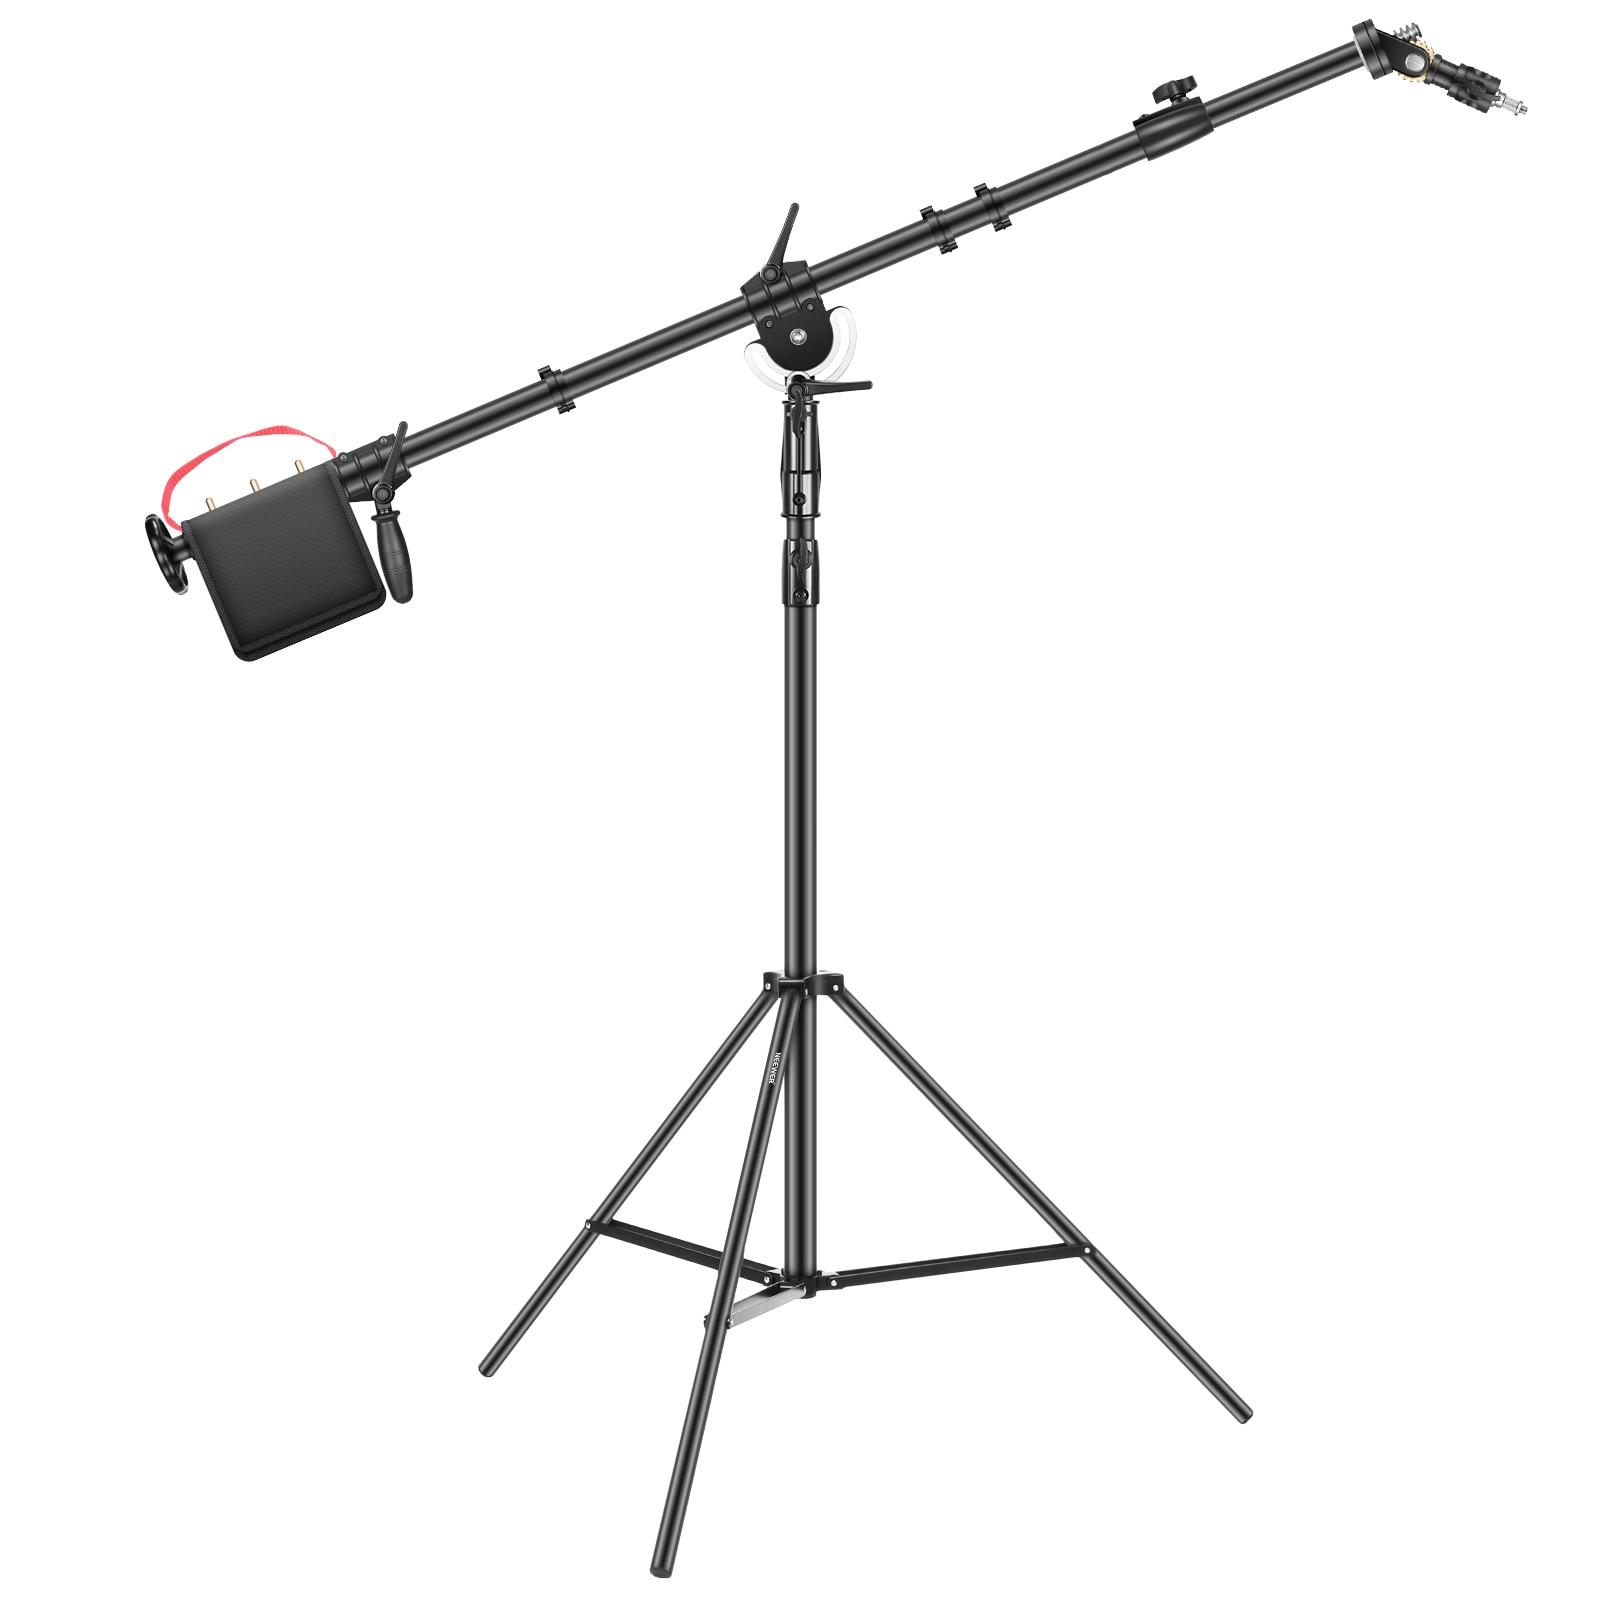 Neewer-حامل ضوء التصوير الفوتوغرافي مع ذراع ذراع ذراع Pro ، حامل ثلاثي القوائم مقاس 88.5 بوصة/225 سنتيمتر مع شريط عرضي 252.5 سنتيمتر لـ Monolight ستروب Softbox